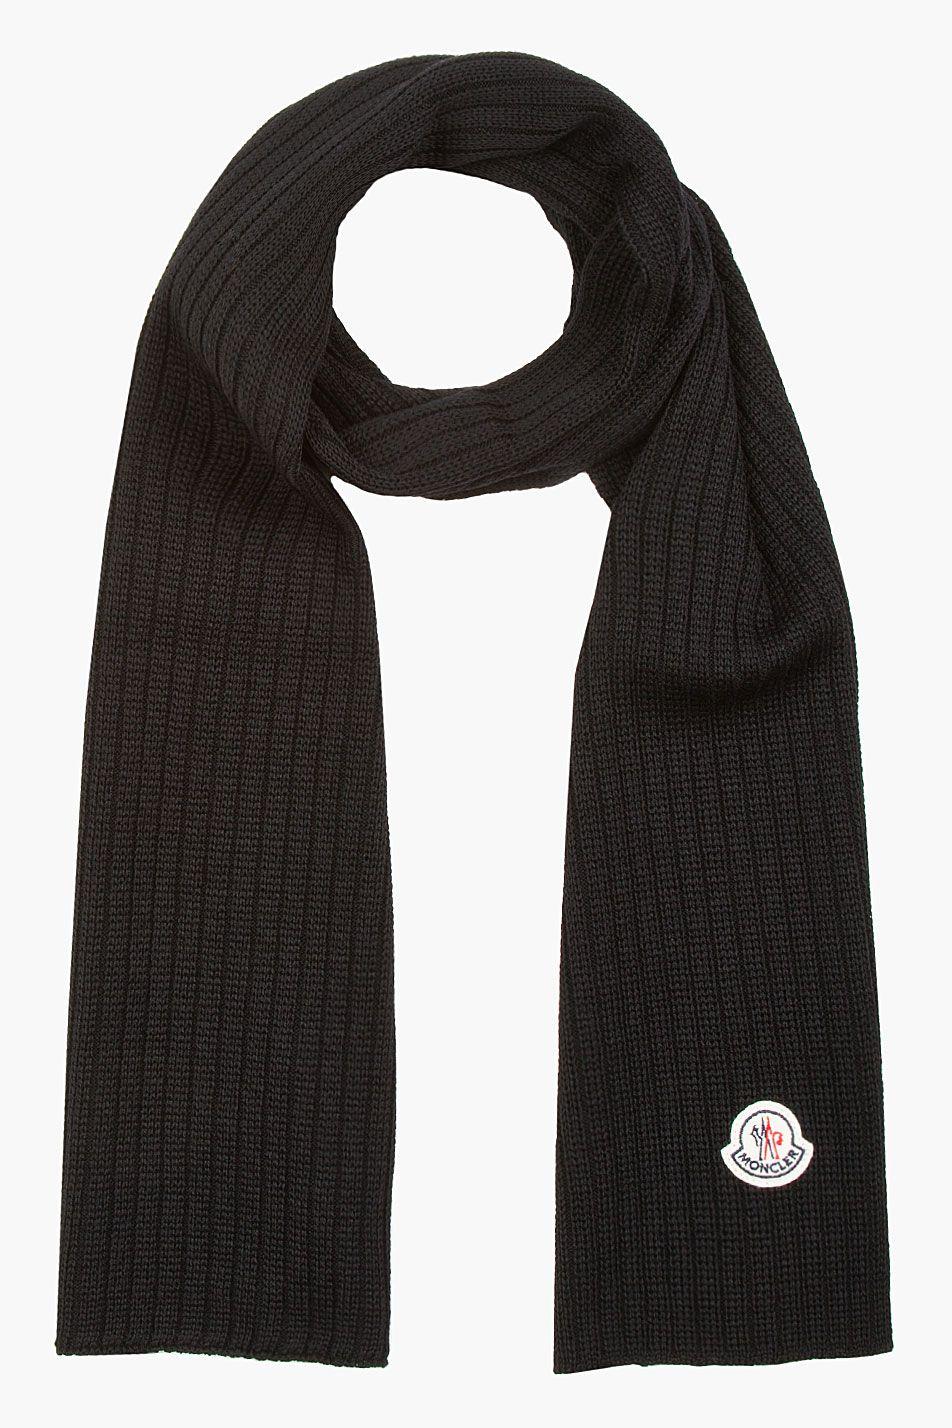 moncler black scarf